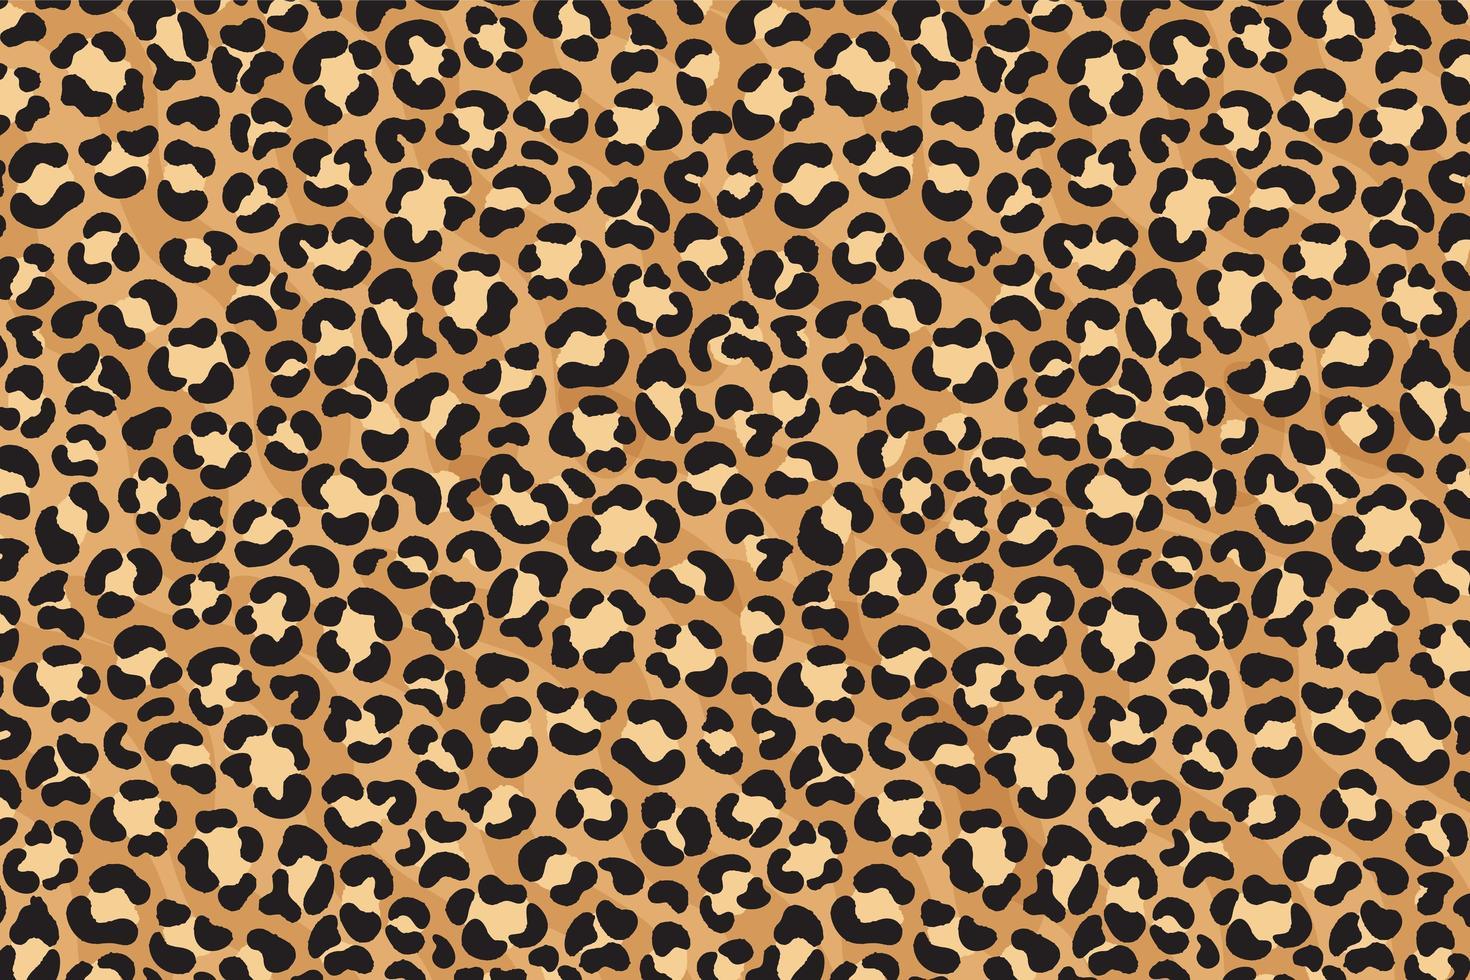 Leopard print design. Cheetah skin. Animal print. vector